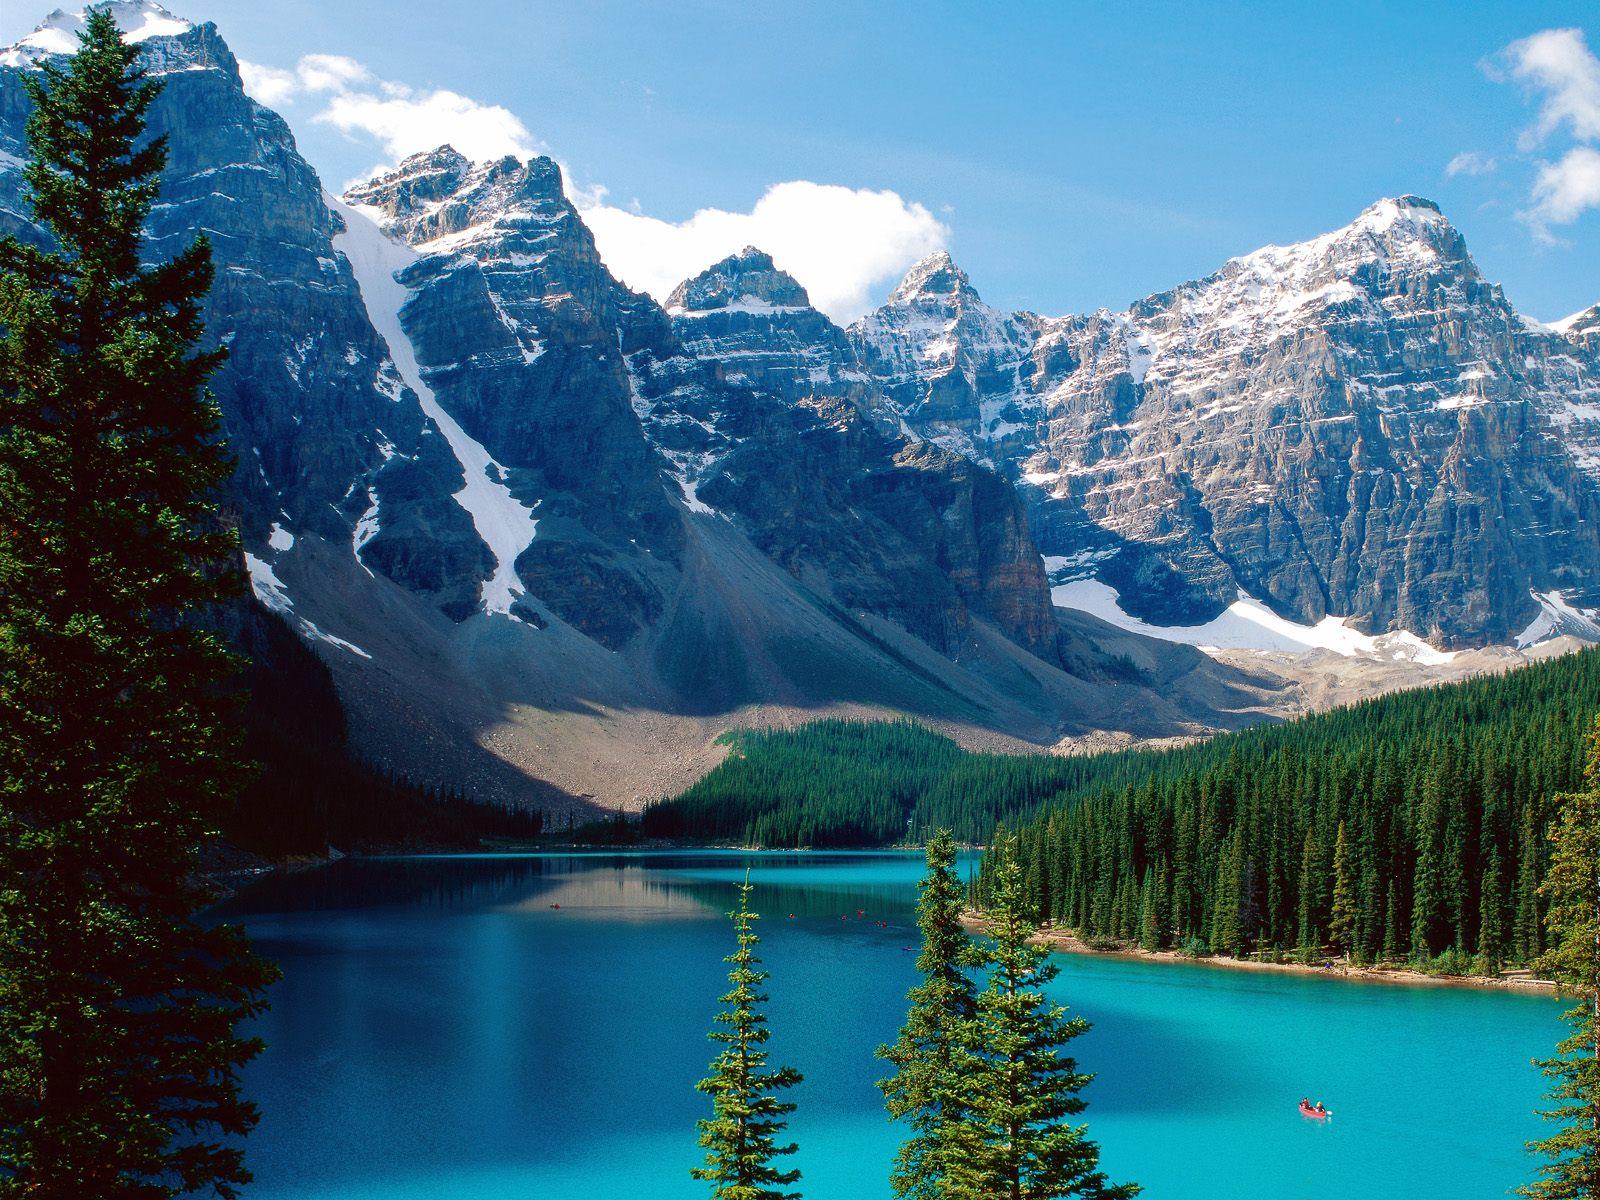 http://2.bp.blogspot.com/_HkbWdsz-H8g/S74FUOQBUjI/AAAAAAAAIkk/dWGtZHjRfLc/s1600/Moraine+Lake,+Banff+!%20%20National+Park,+Canada.jpg